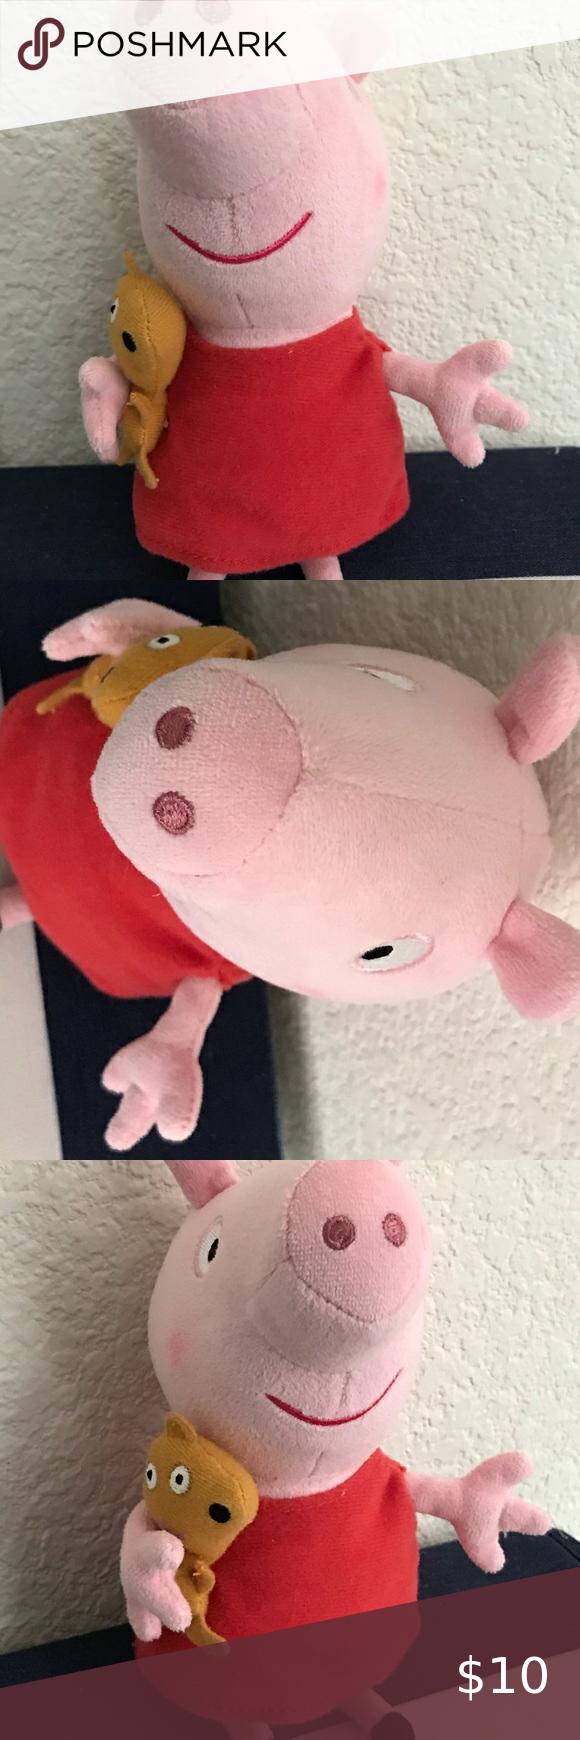 Peppa Pig Sweet Plush Toy Peppa Pig Plush Pig Plush Plush Toy [ 1740 x 580 Pixel ]